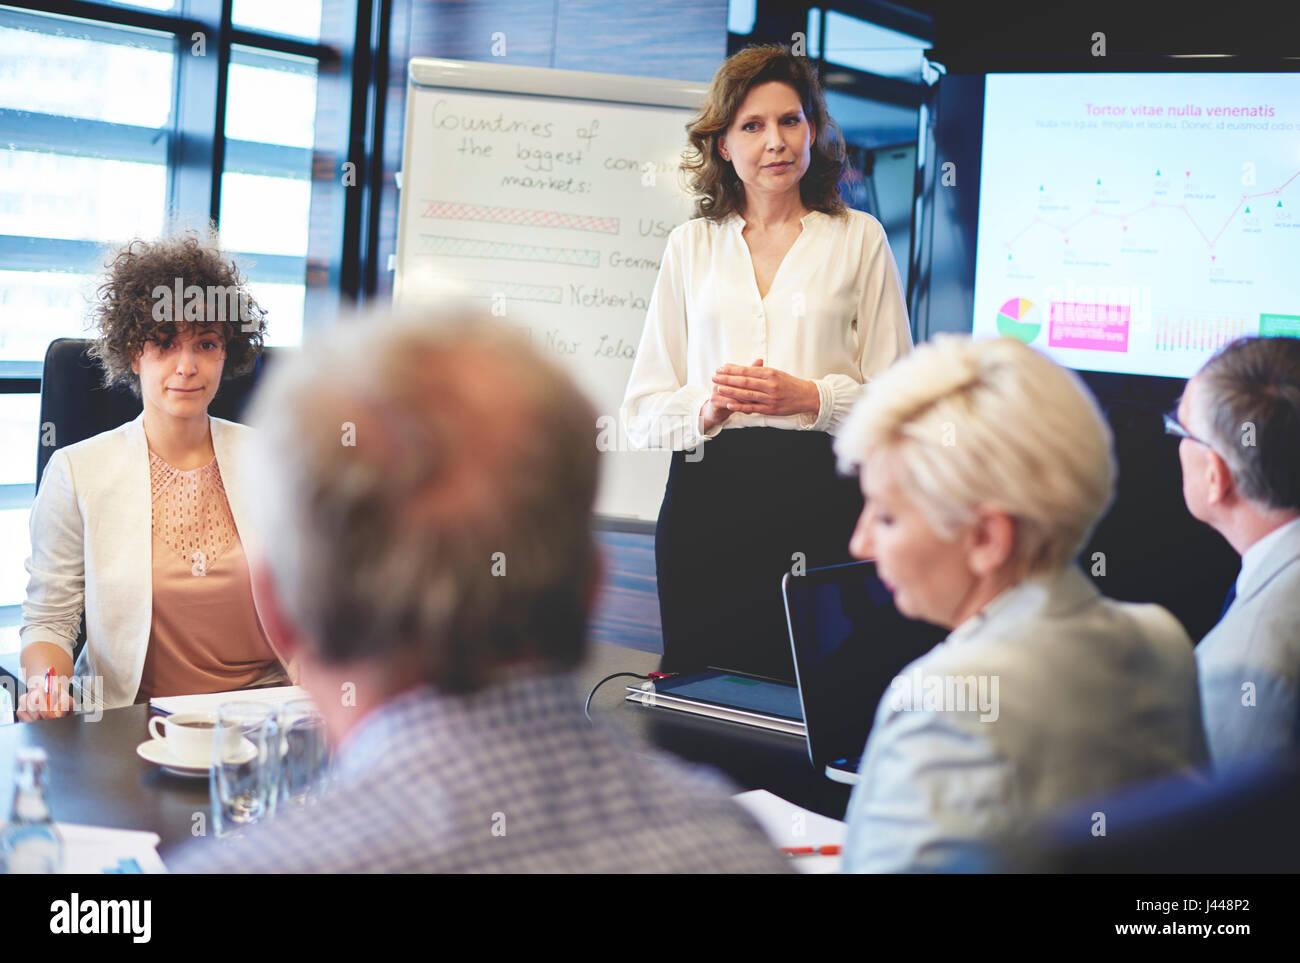 Anführerin mit Business-Präsentation Stockbild